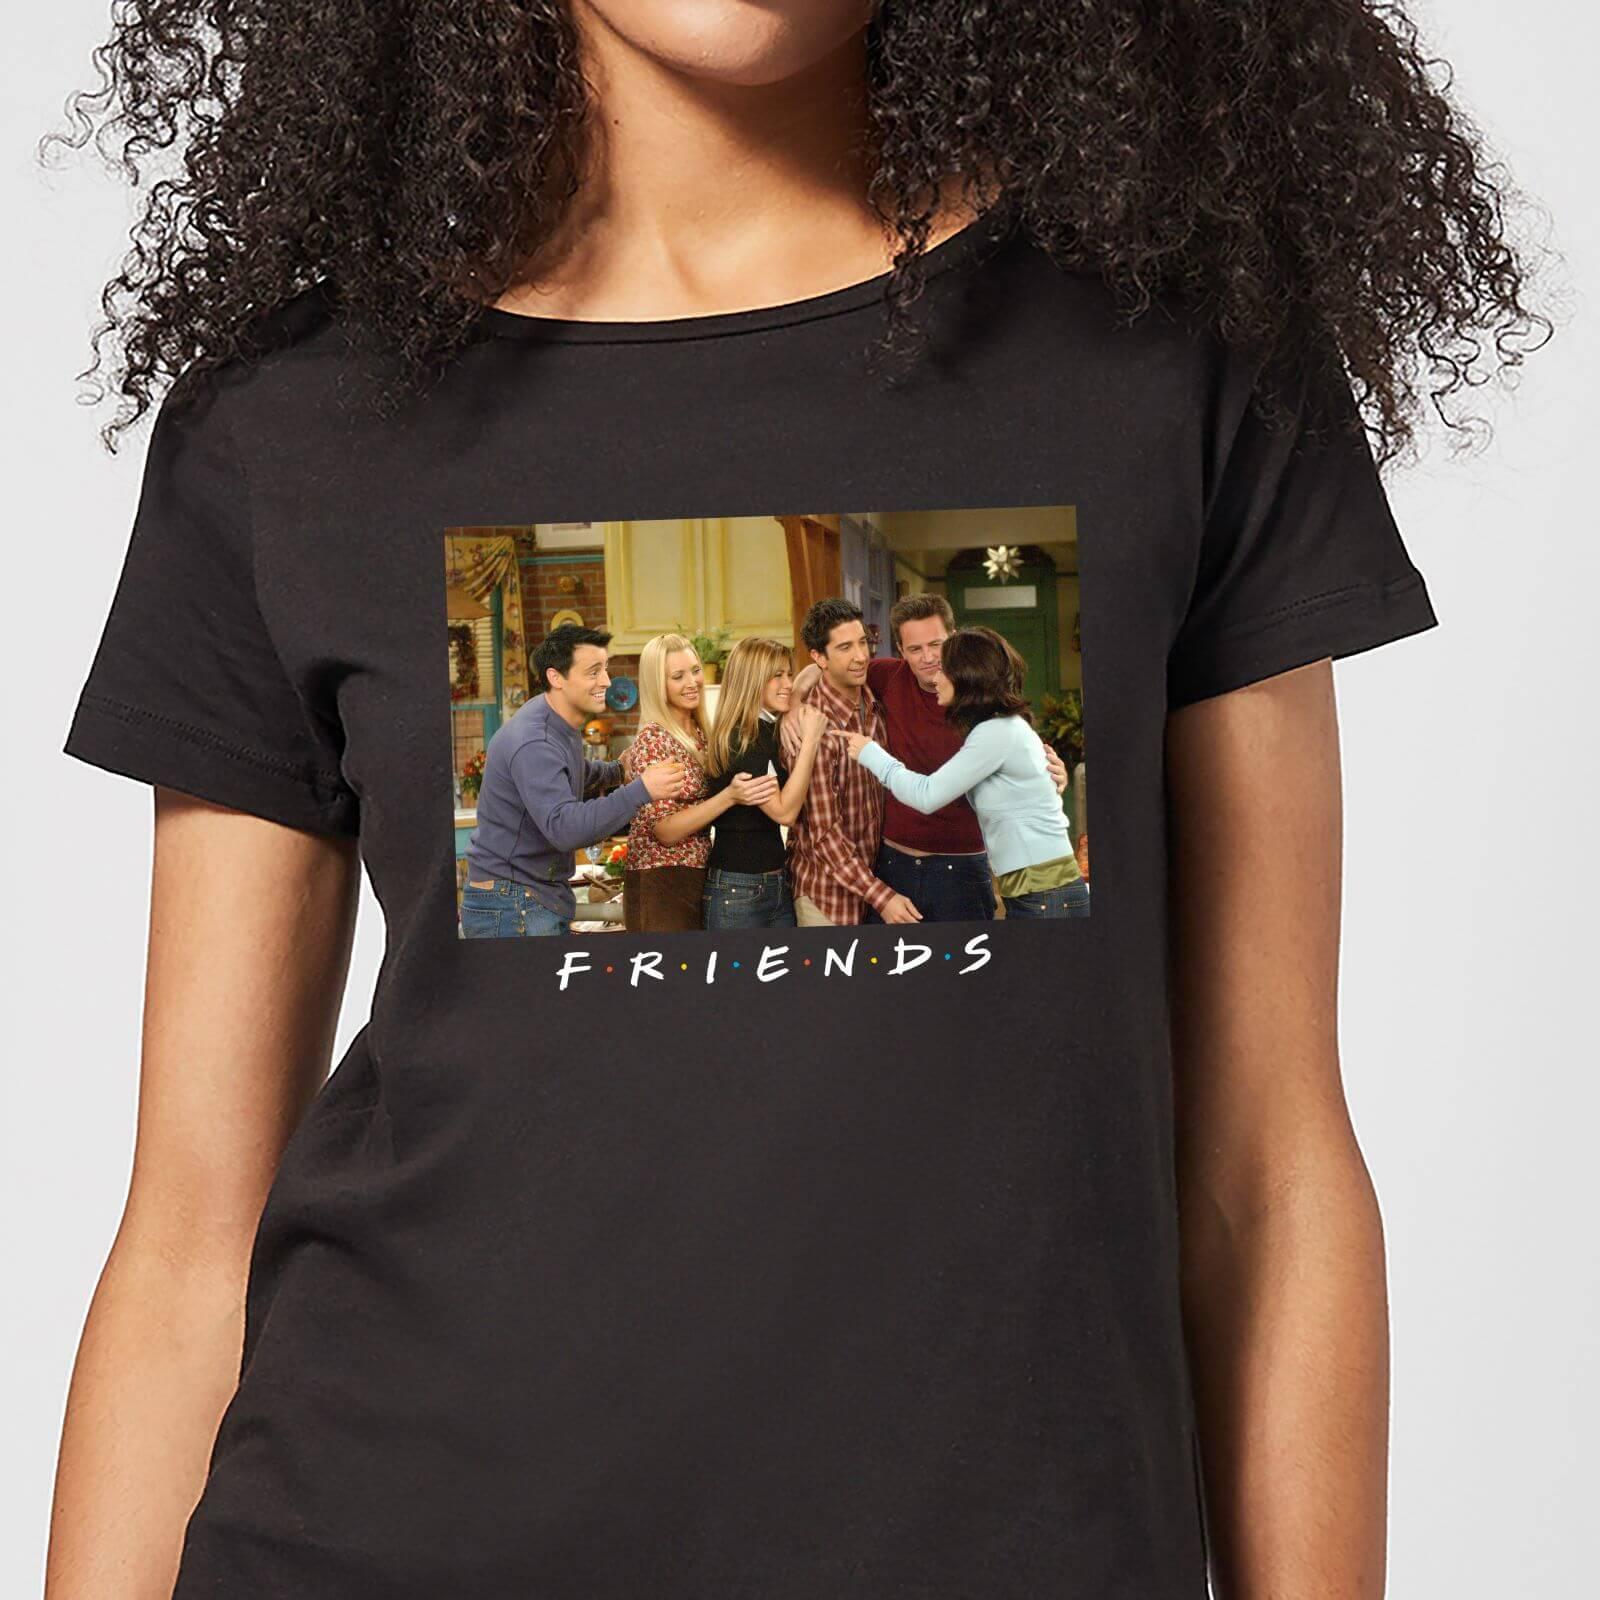 Friends Cast Shot Women's T-Shirt - Black - 3XL - Black